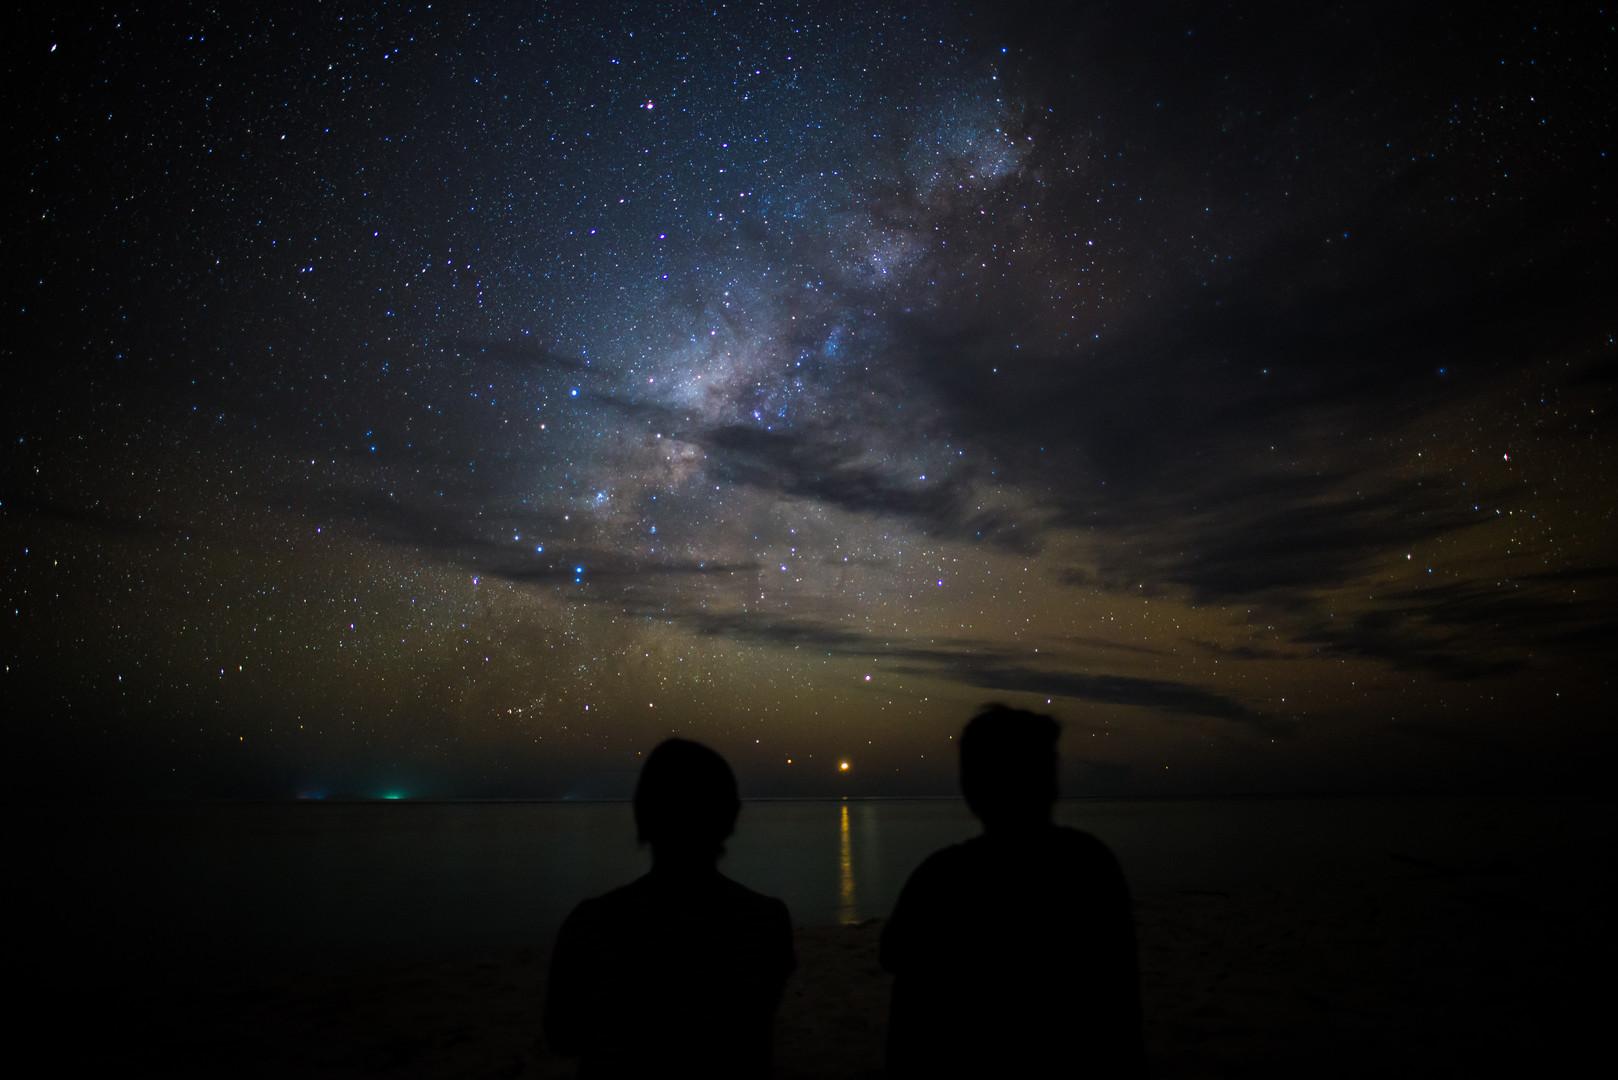 Portrait under the Milky Way